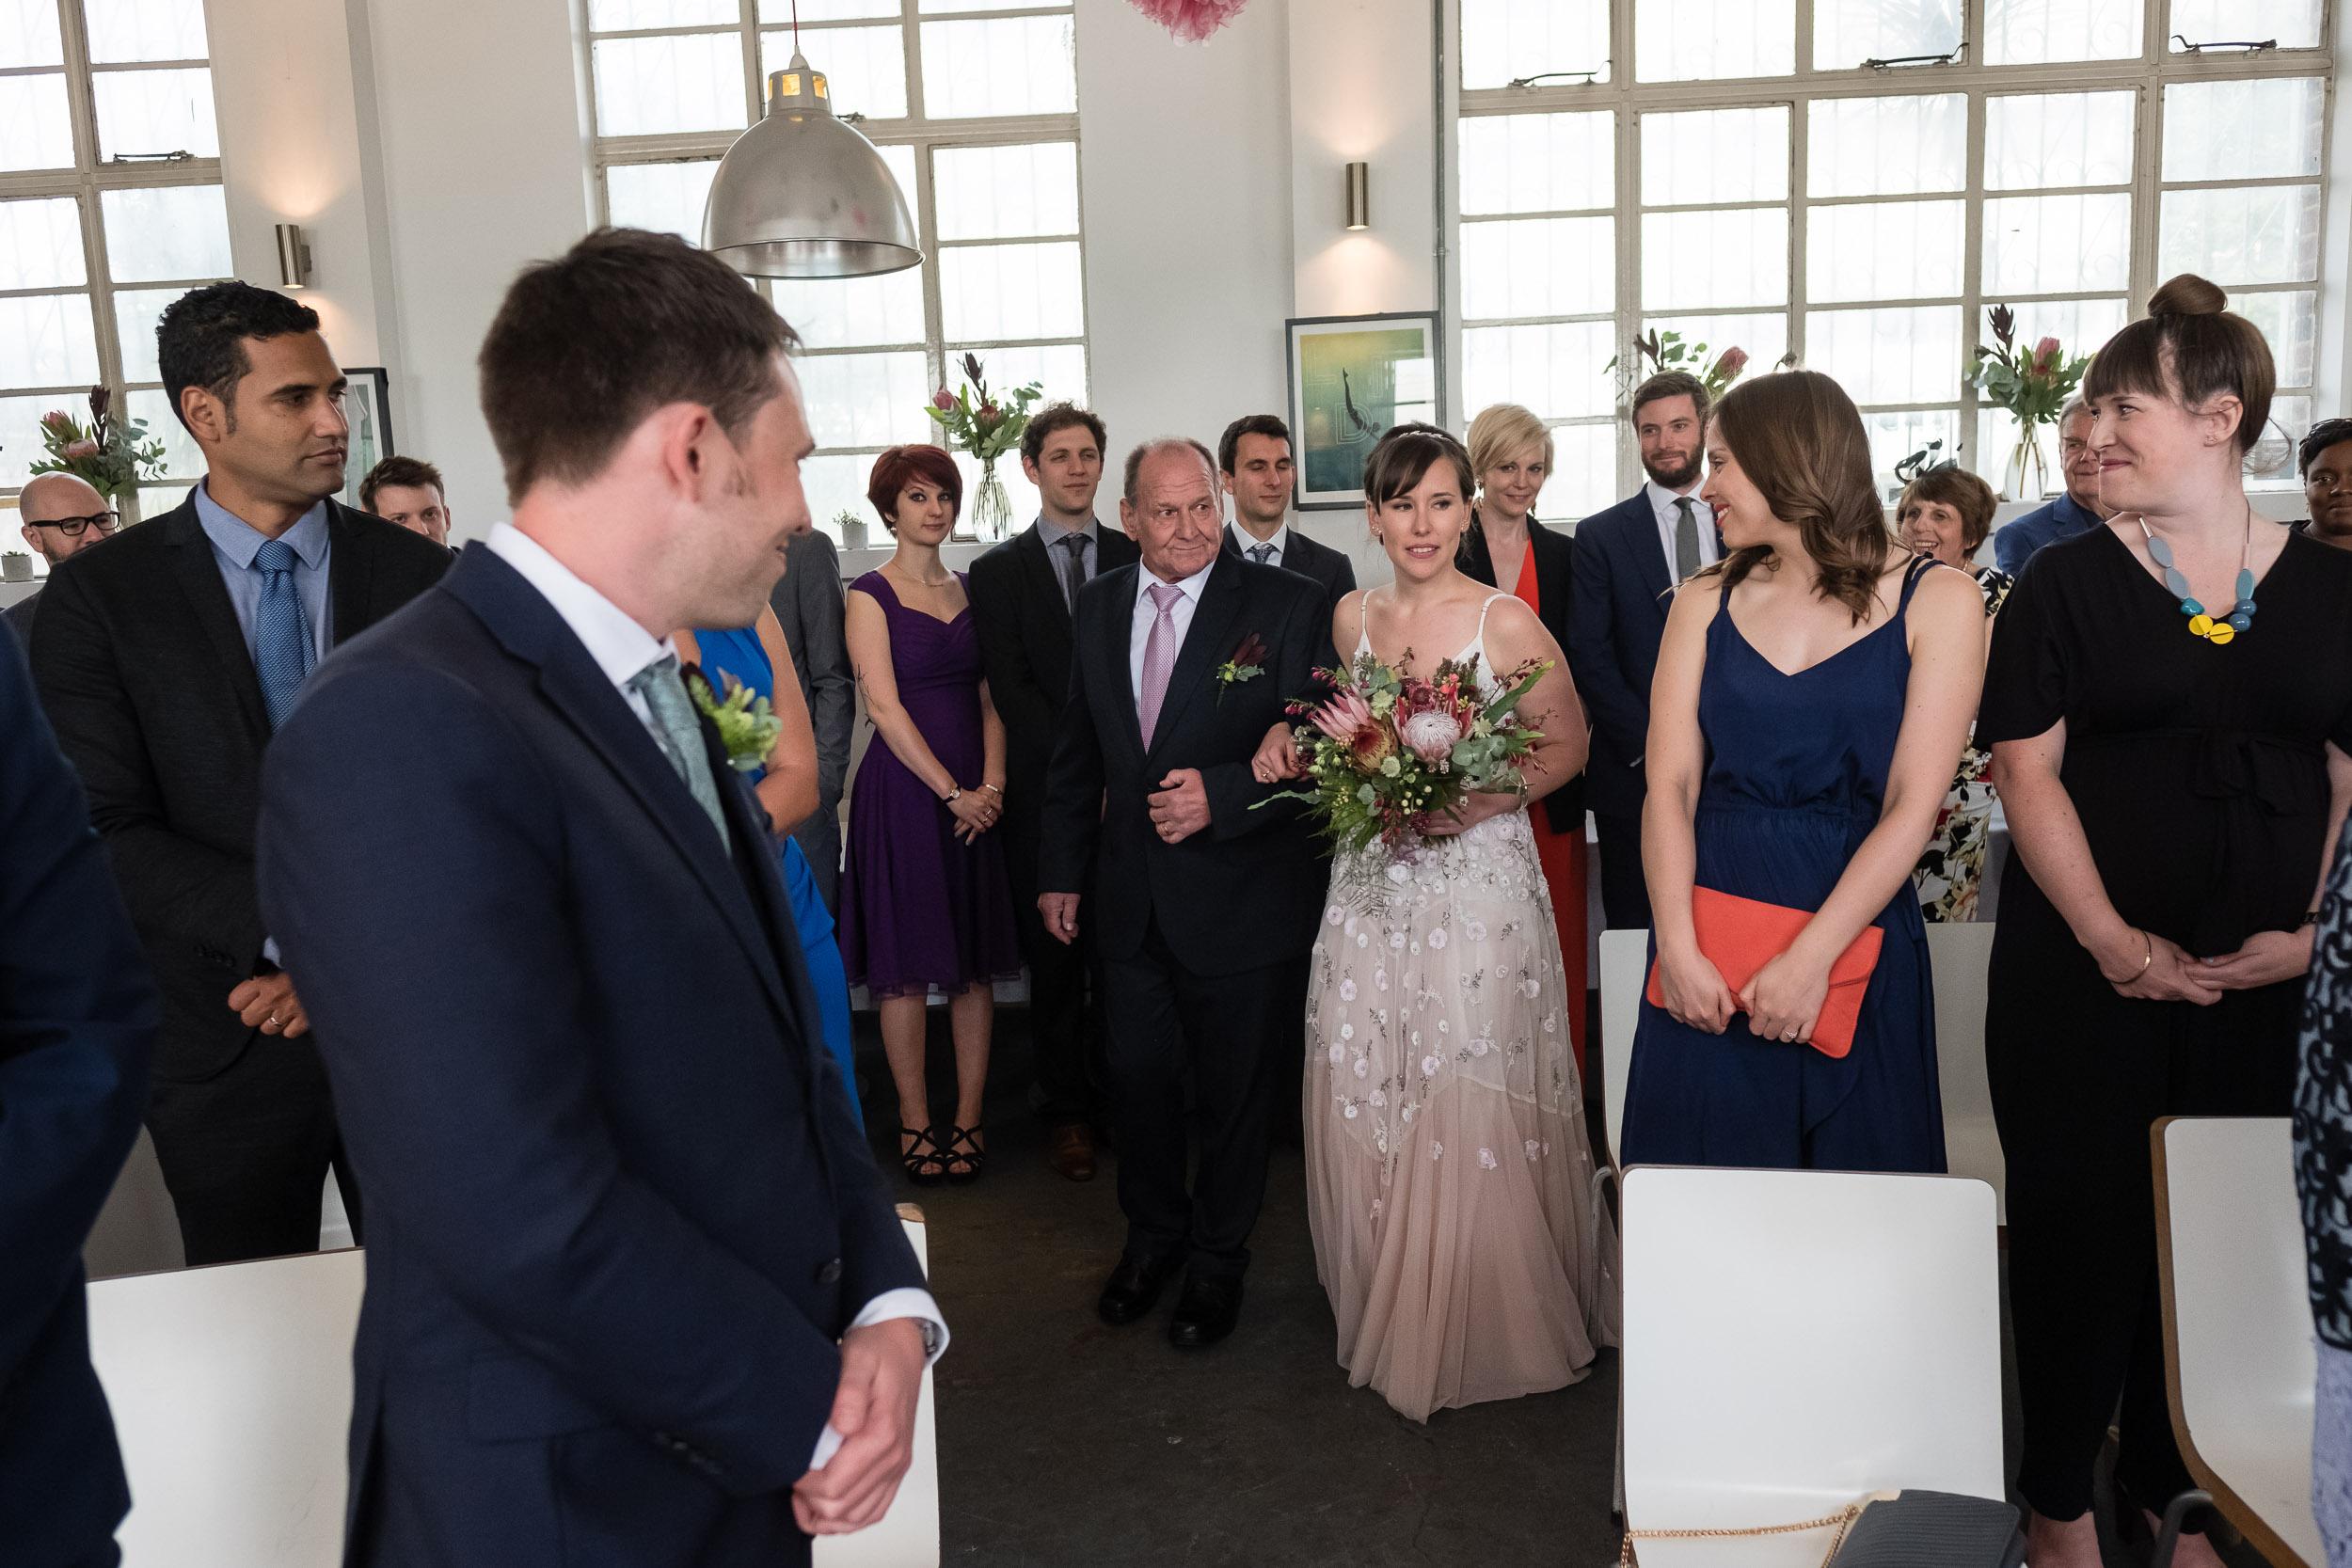 brockwell-lido-brixton-herne-hill-wedding-121.jpg